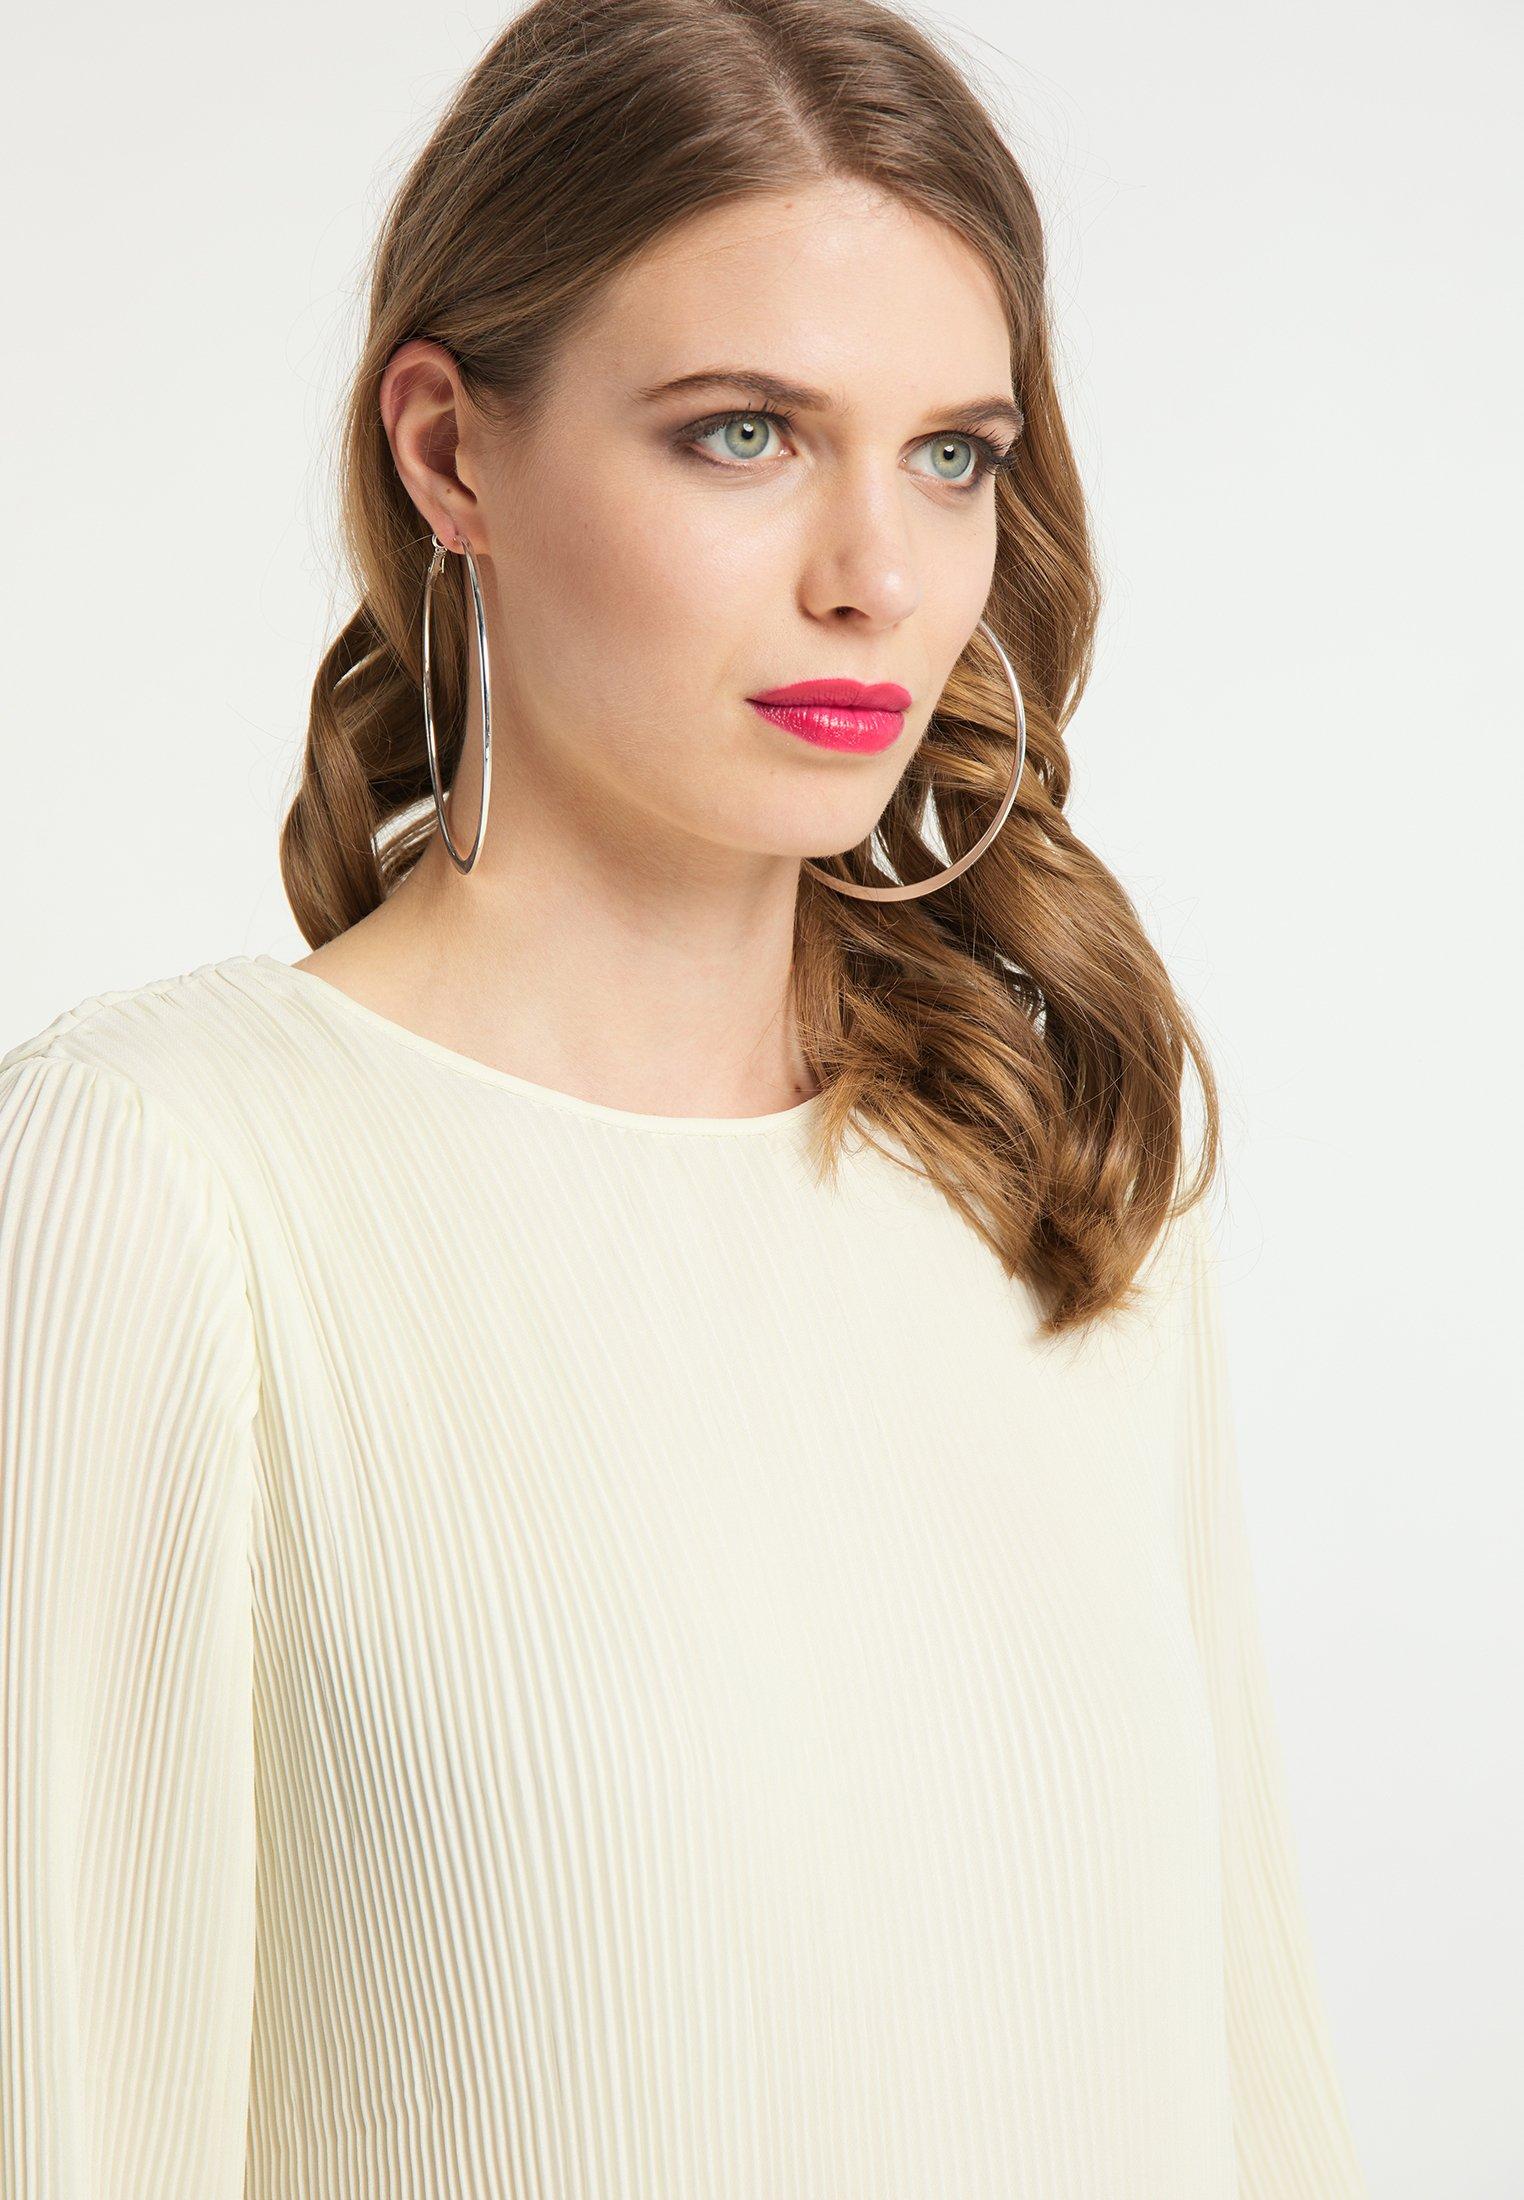 Sale Women's Clothing faina Blouse wollweiss 9NxAHypA7